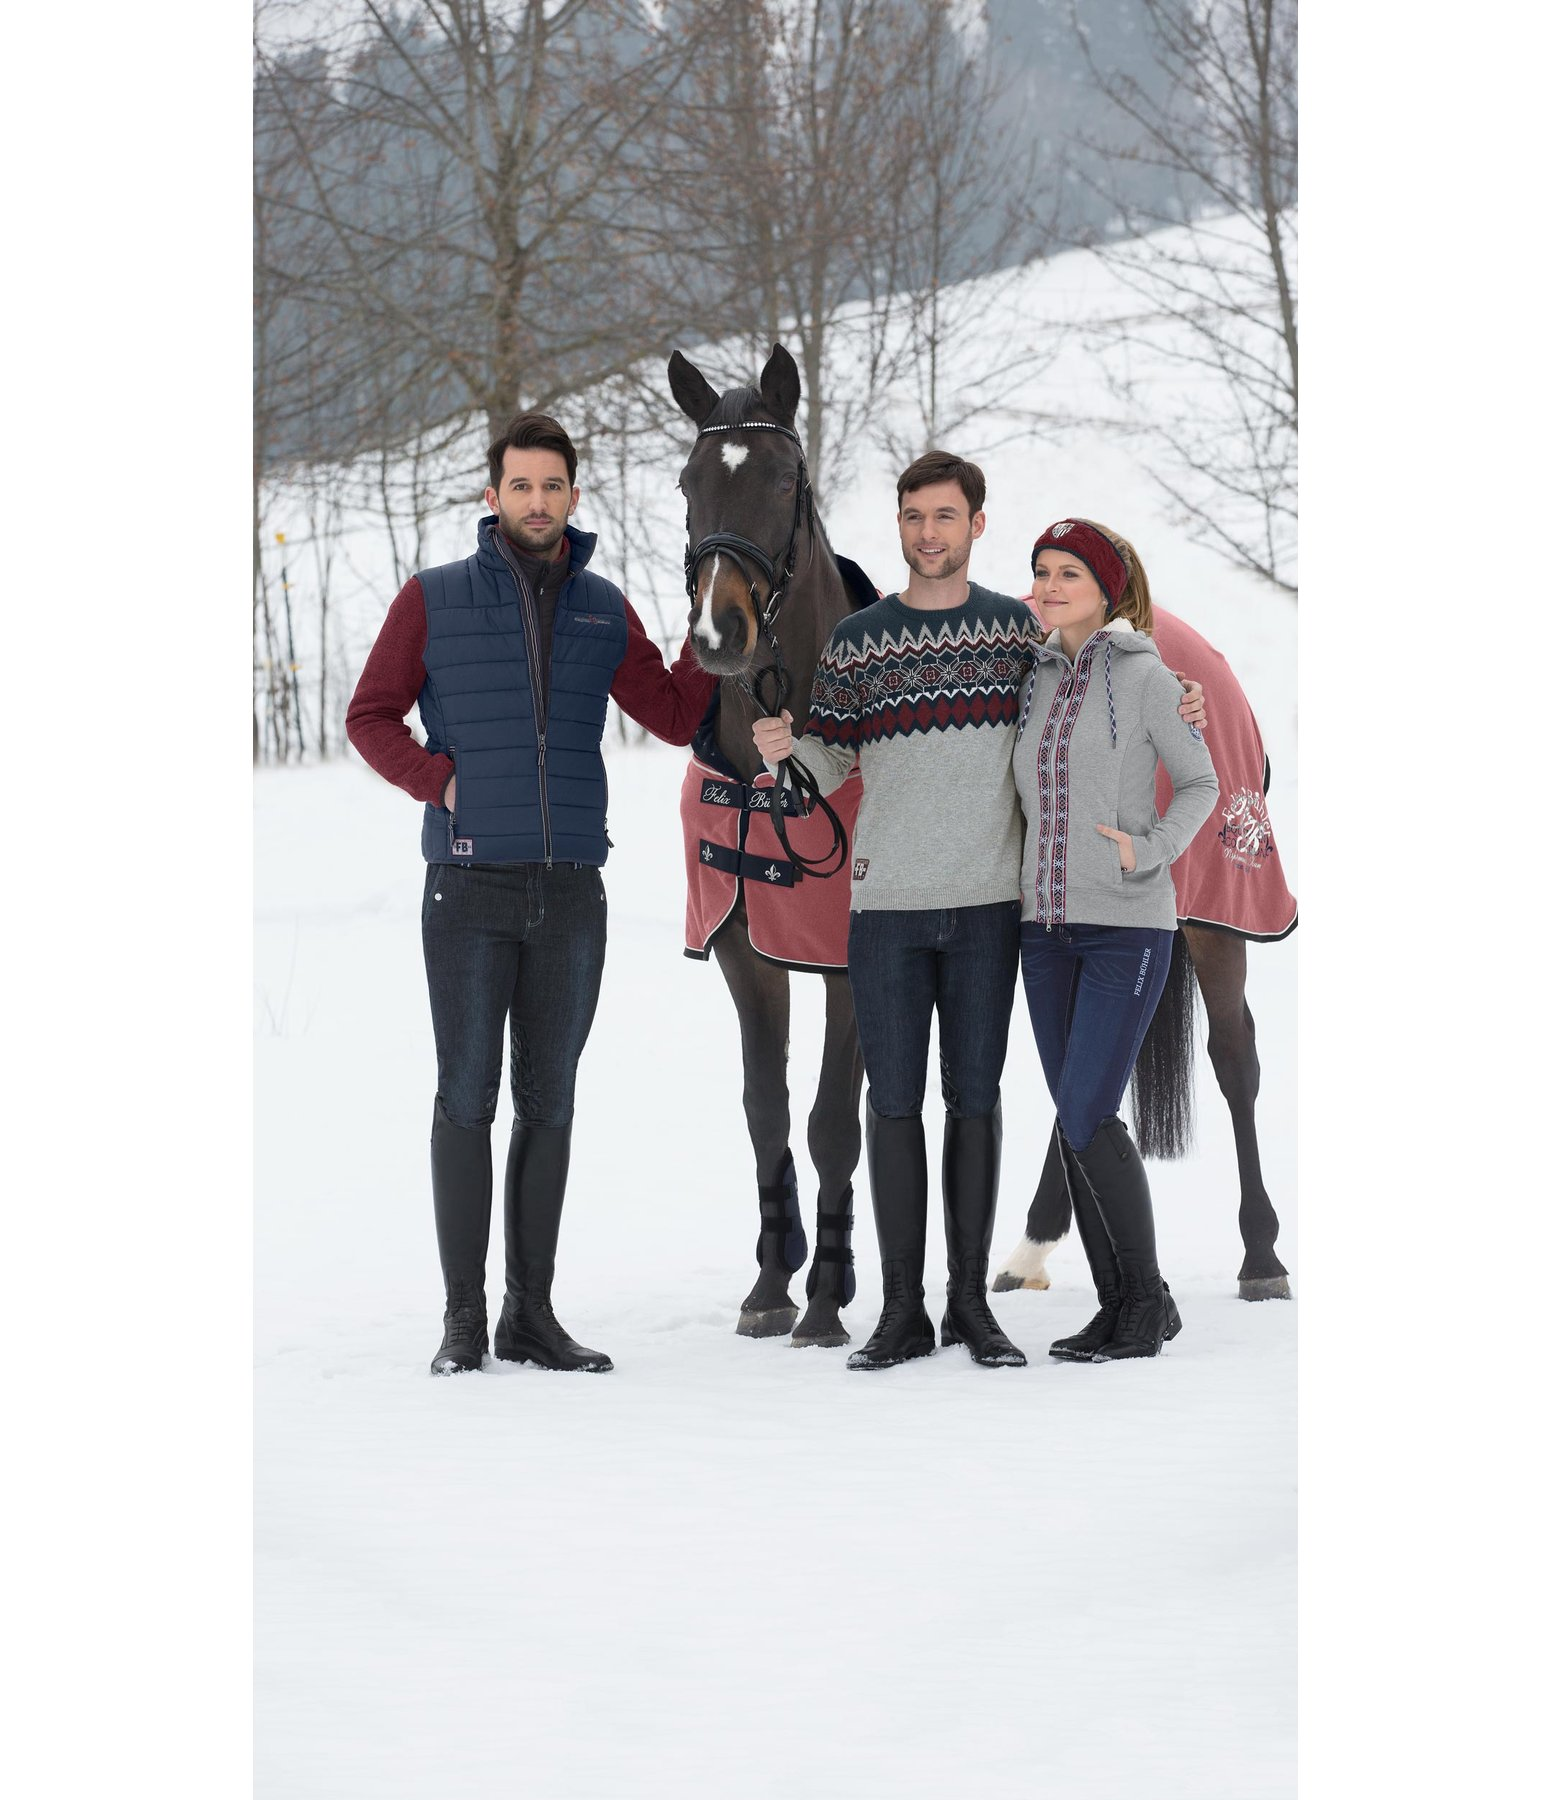 Pullover homme Jesper - Hauts hommes - Kramer Paardensport f925d8dadc9f